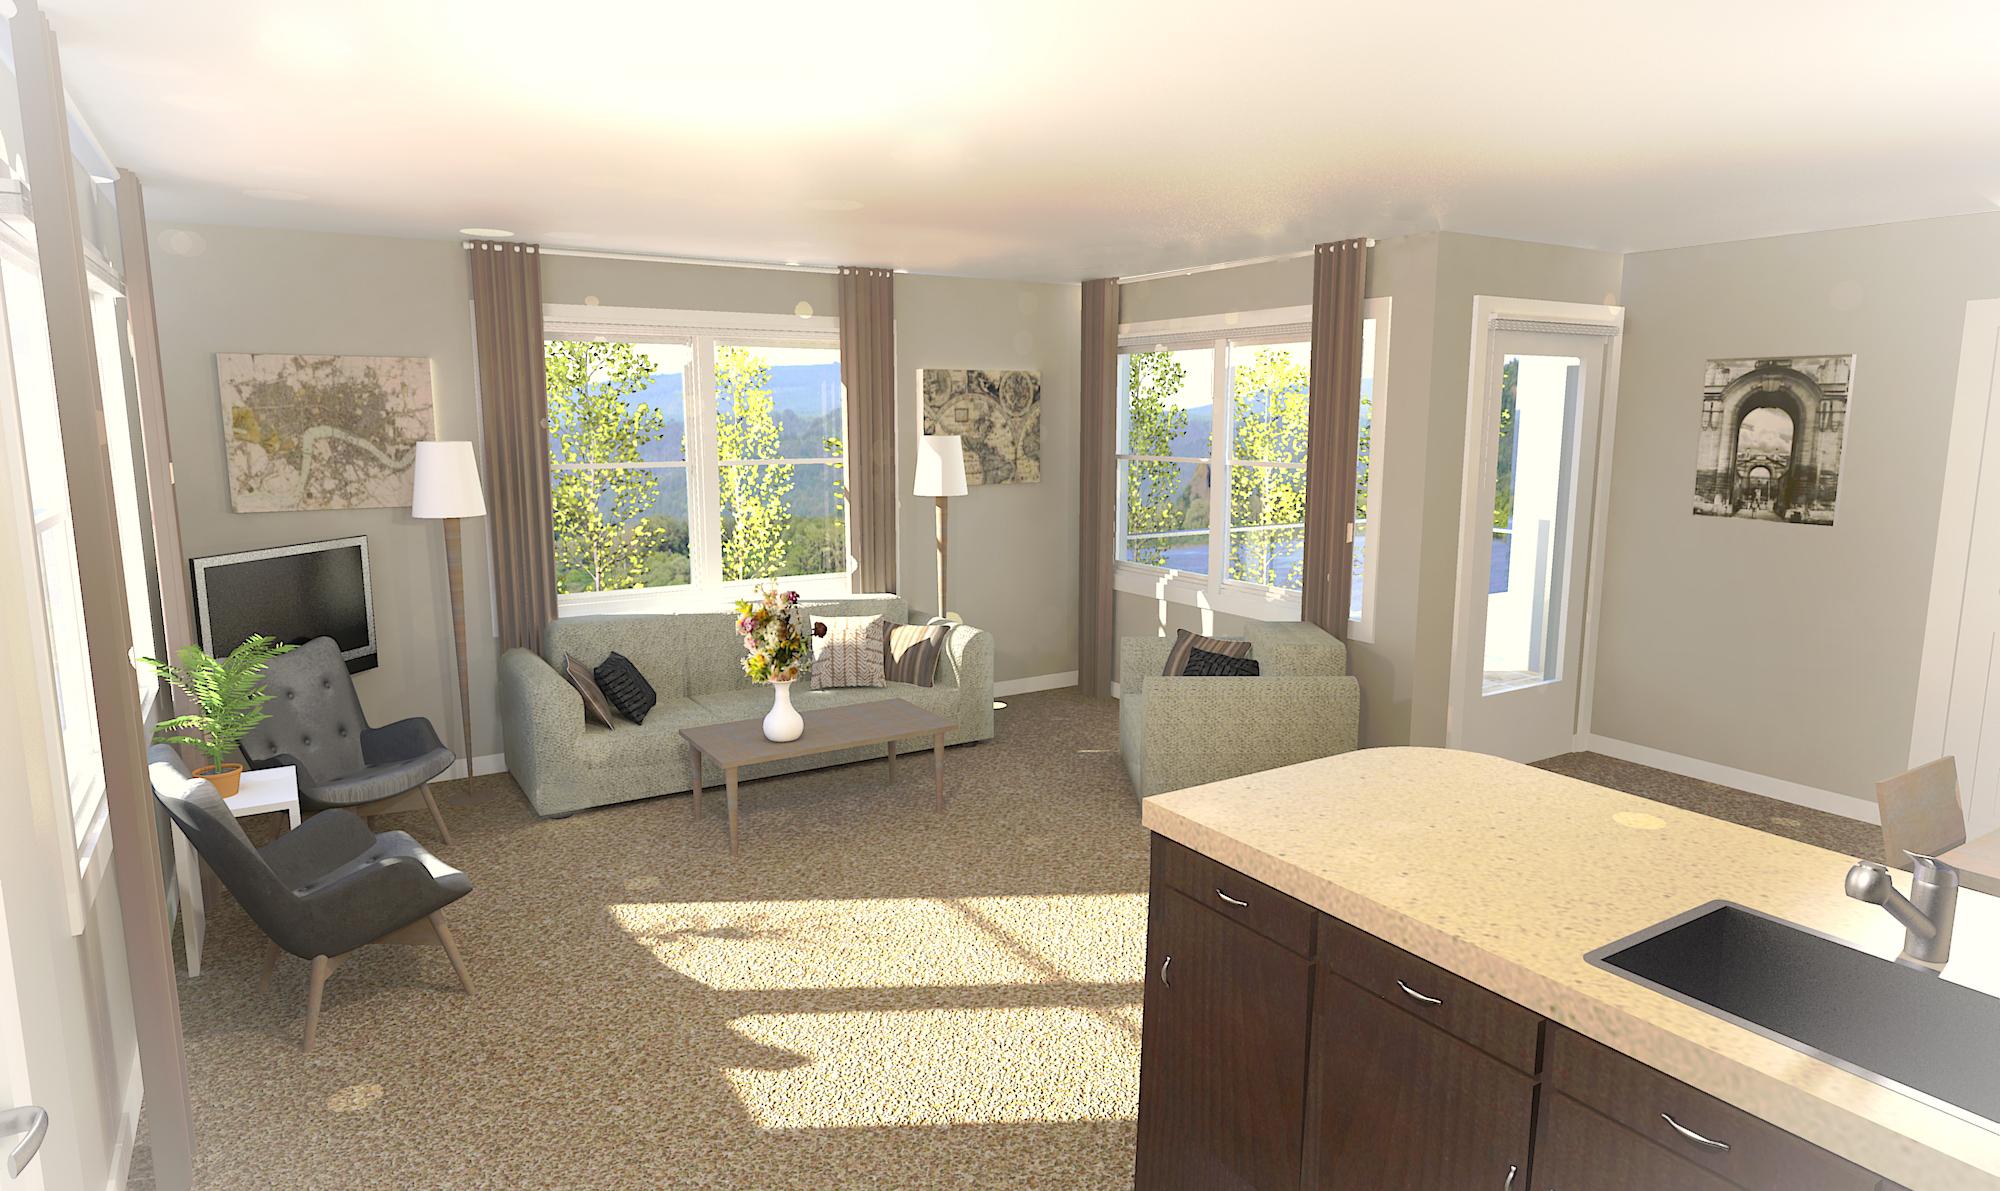 creative inc kelowna in interior design page interiors planning touch used renders rendering portfolio